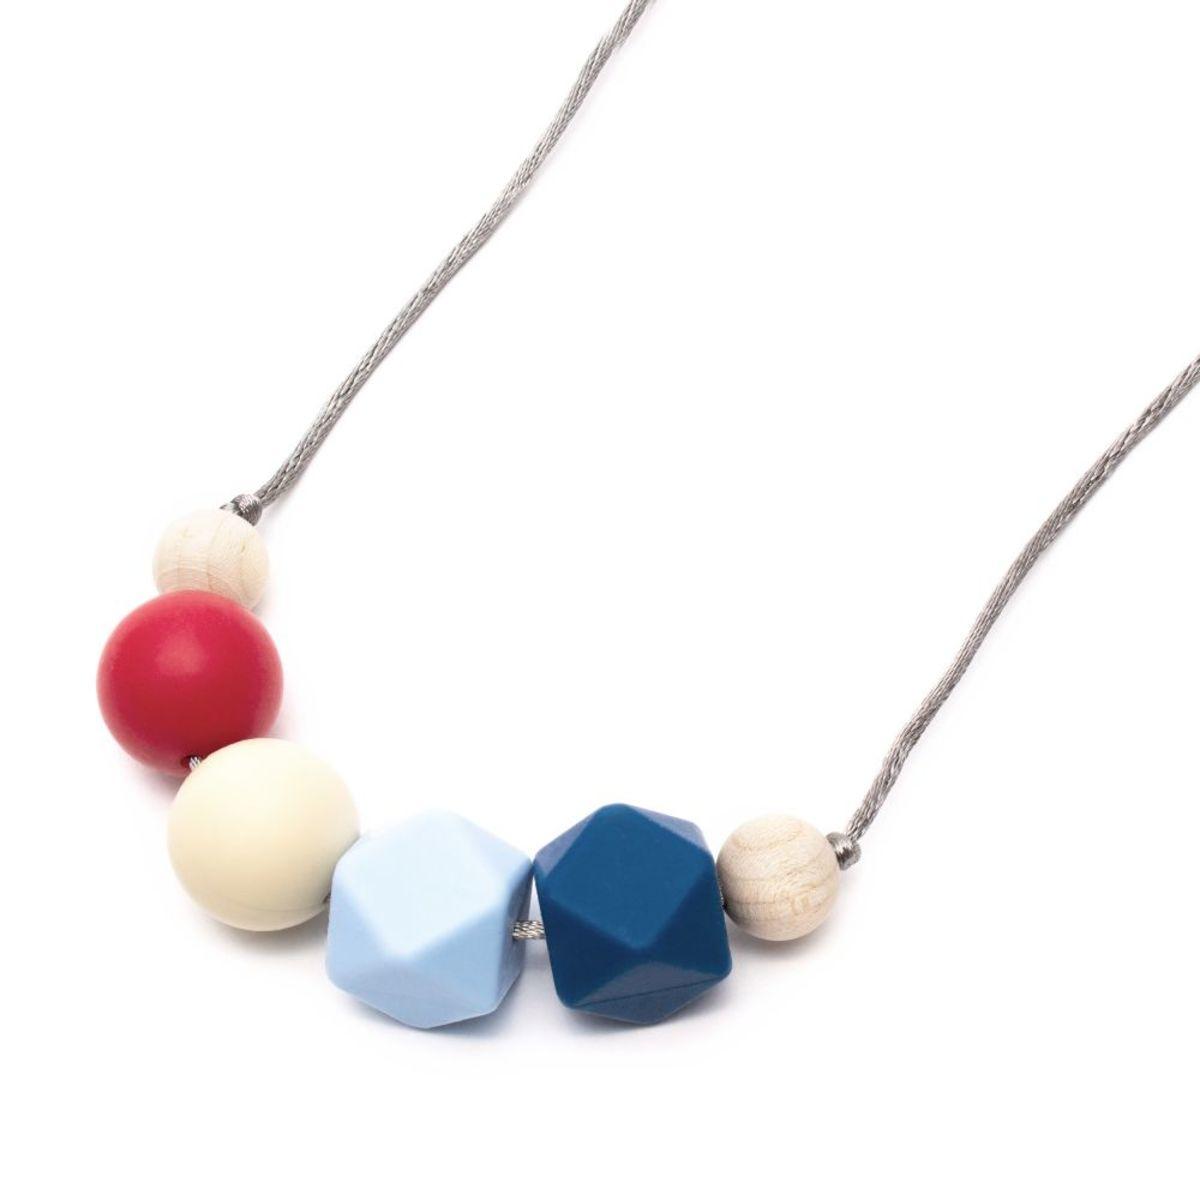 Silikónové dojčiace korále Pápa Silicone necklace